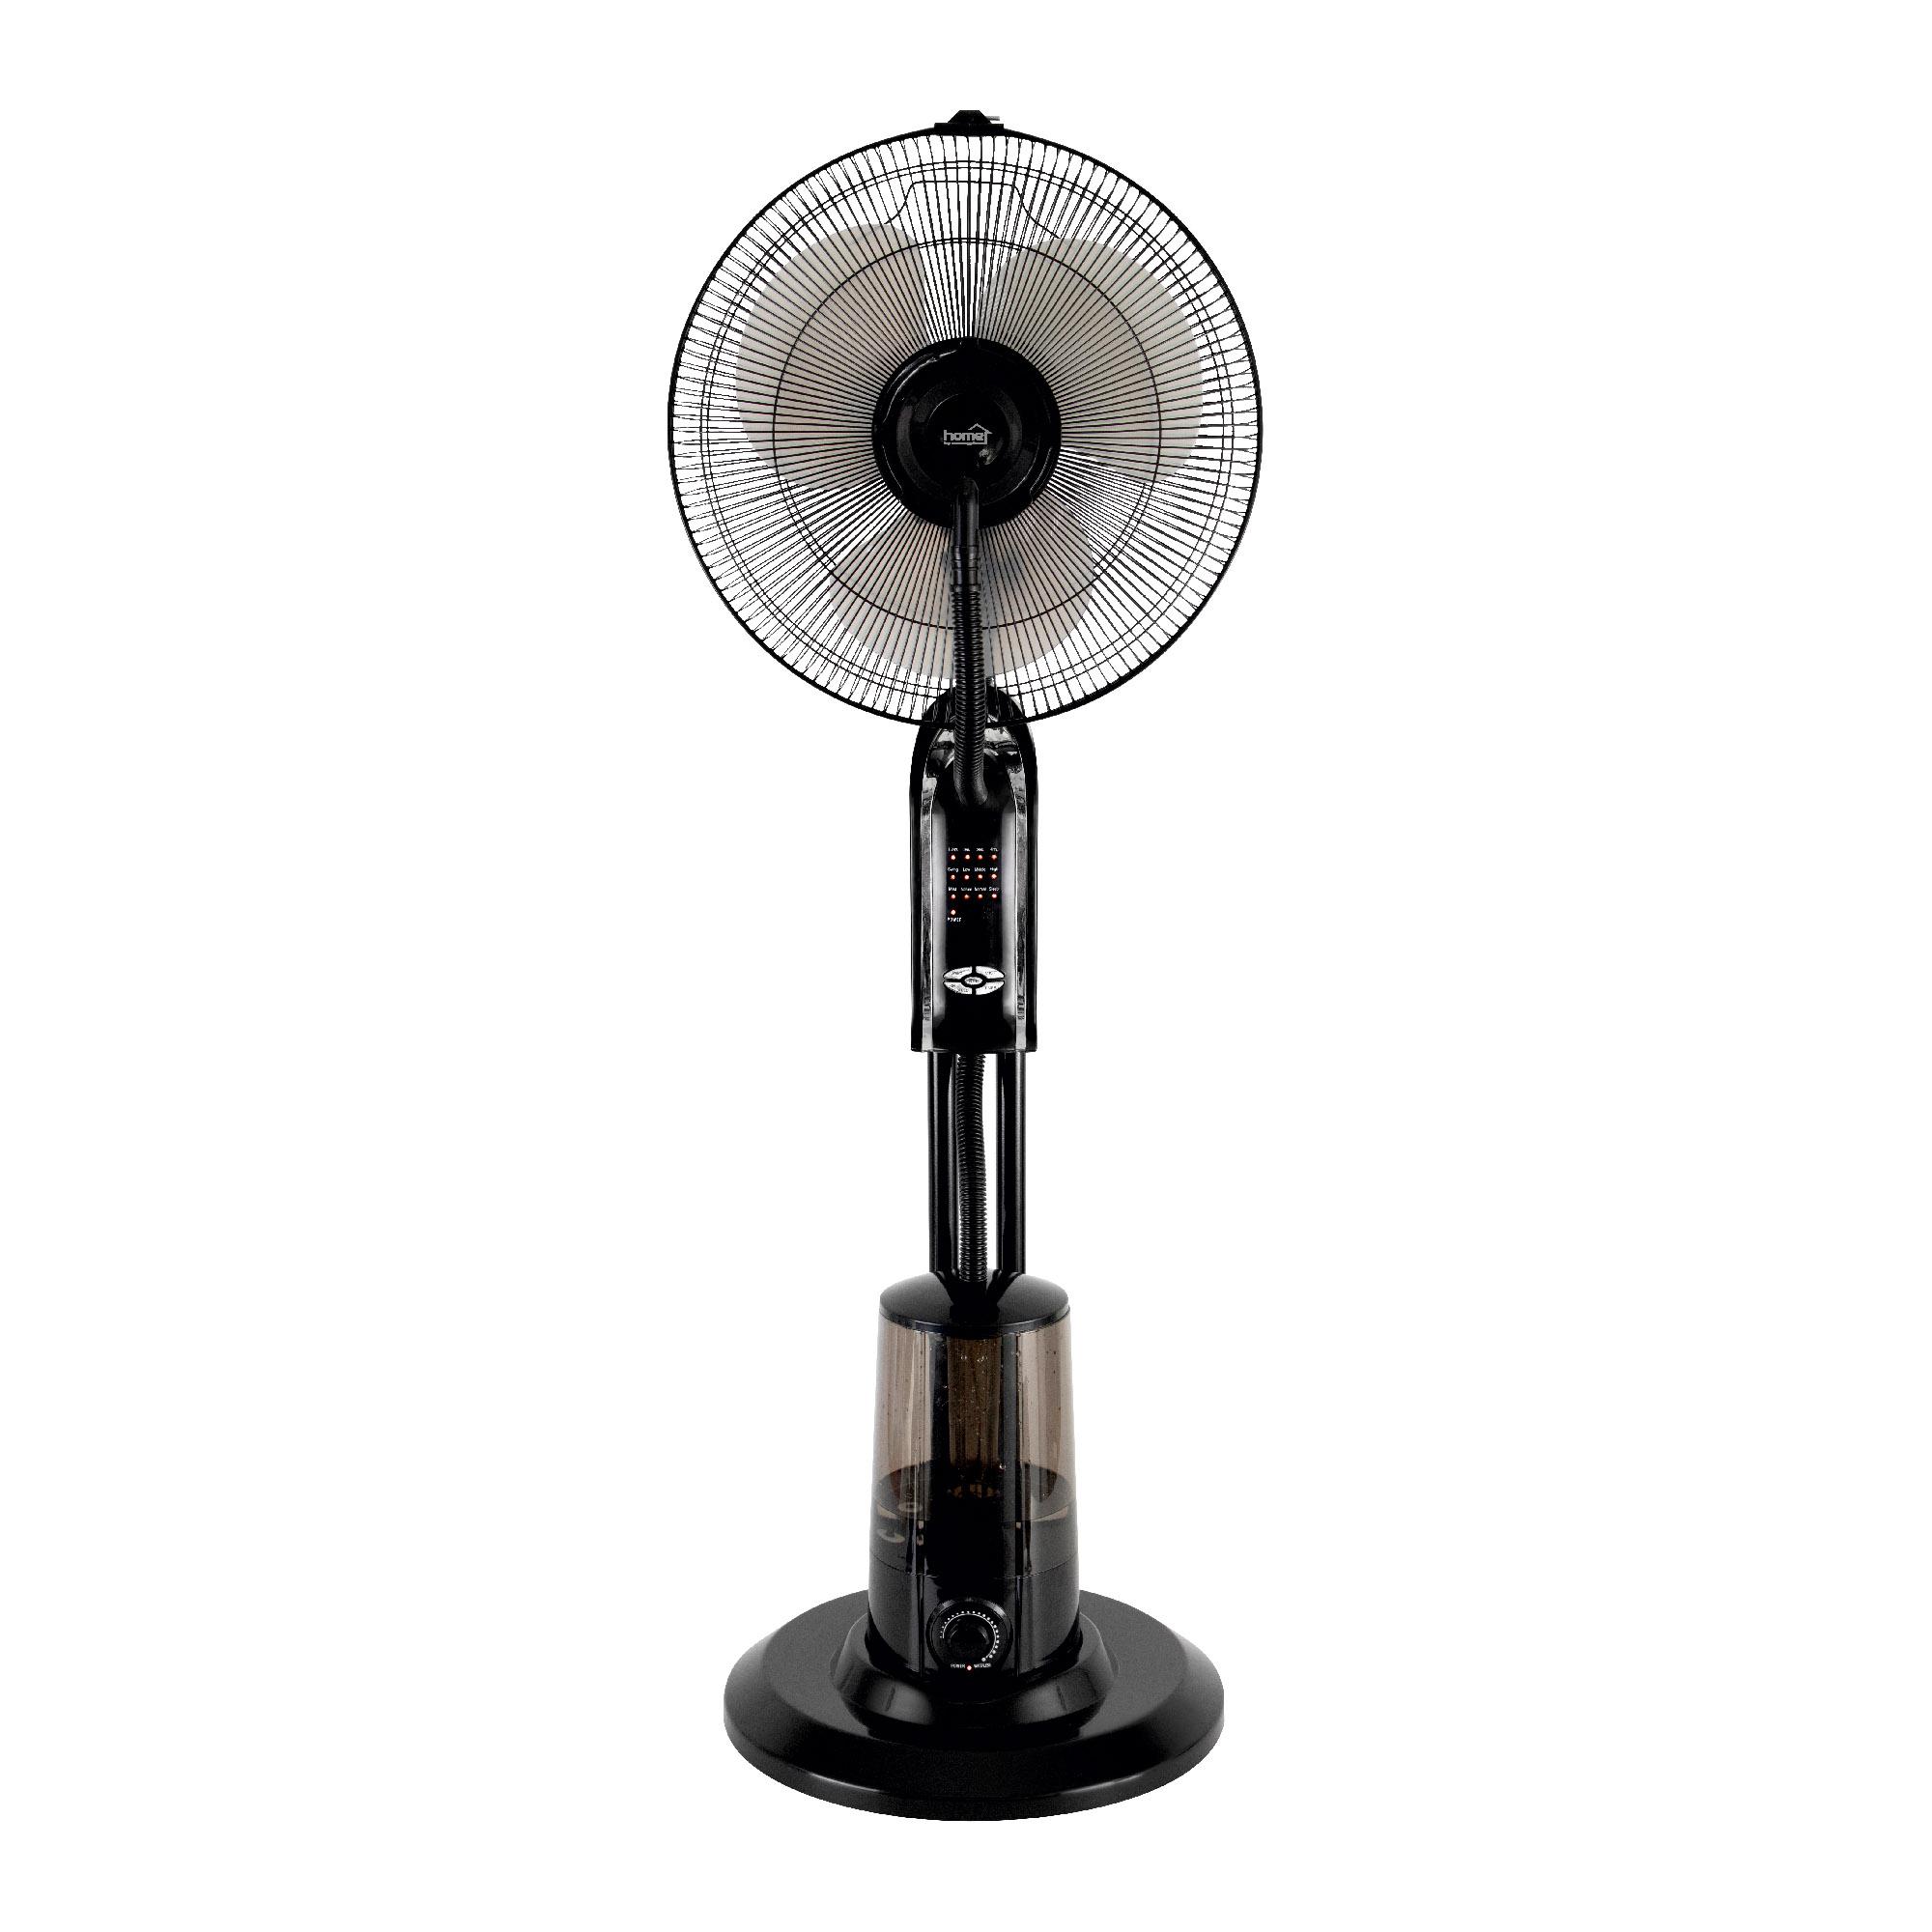 Home by Somogyi SFM 41/BK párásító ventilátor